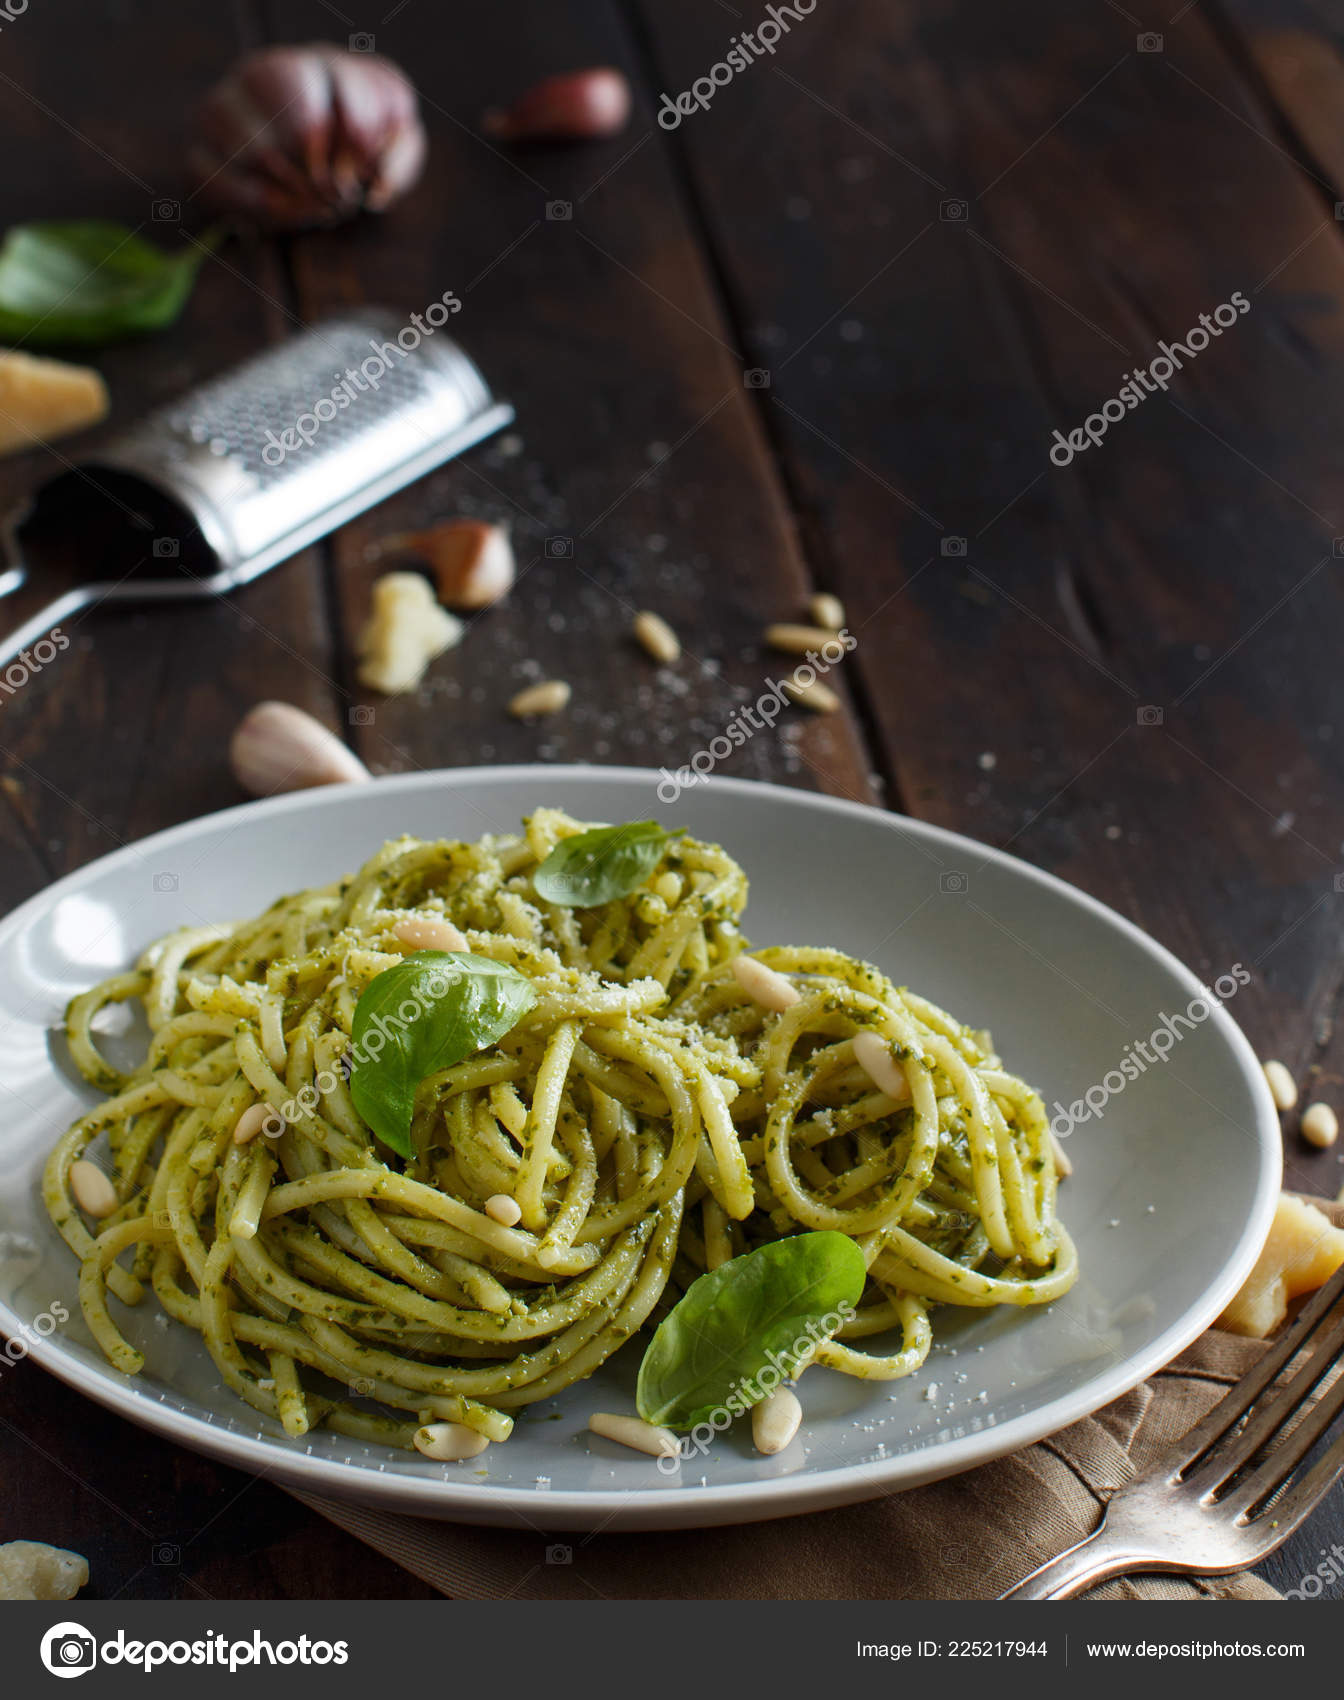 spaghetti nudeln mit pesto sauce basilikum pinienkernen. Black Bedroom Furniture Sets. Home Design Ideas